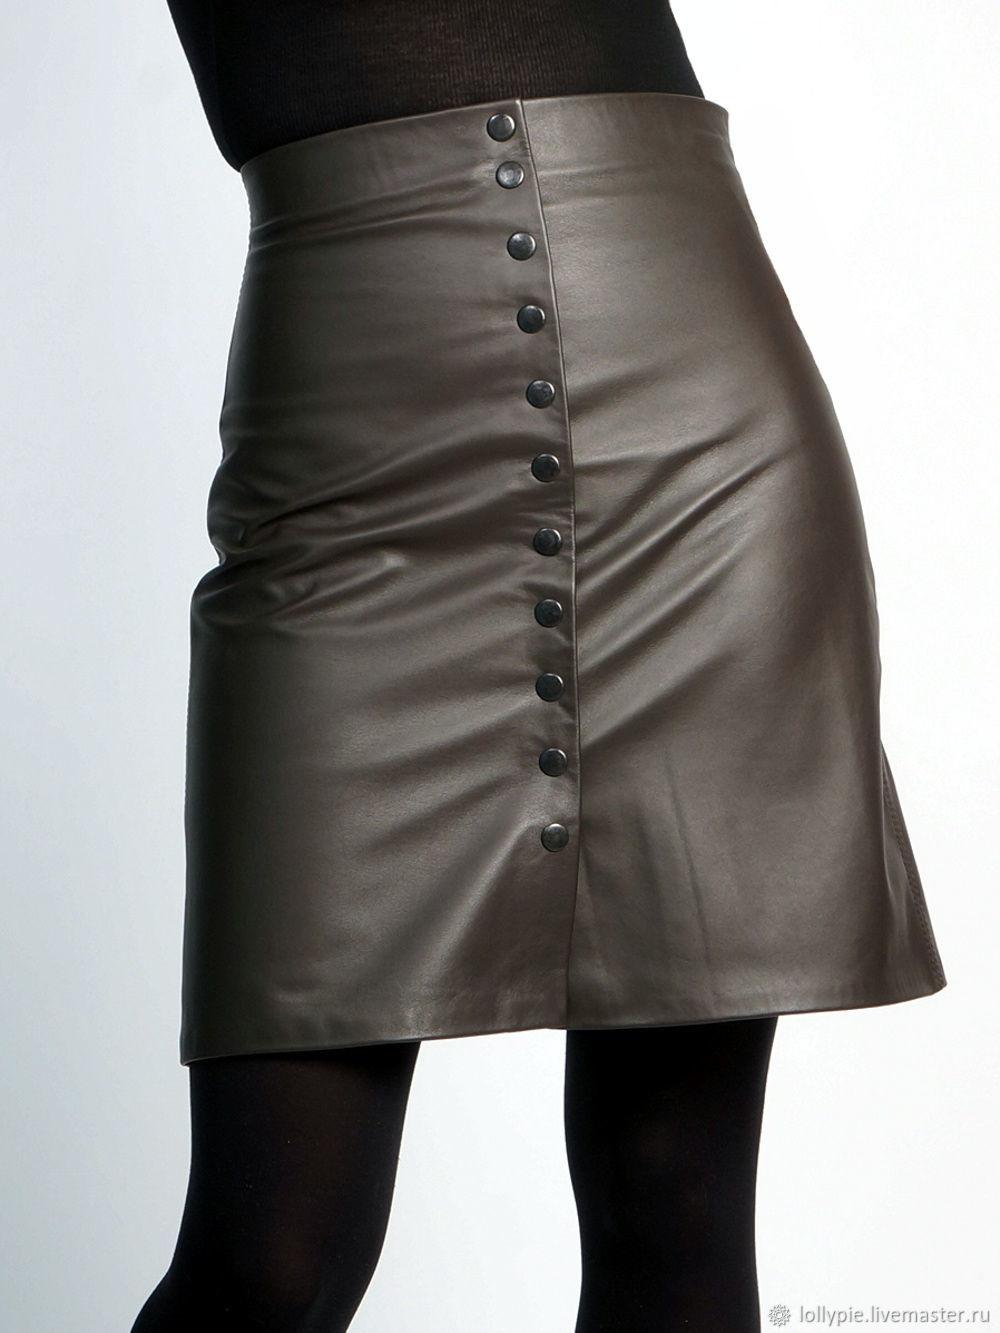 Mini A-line skirt, genuine leather, Skirts, Moscow,  Фото №1